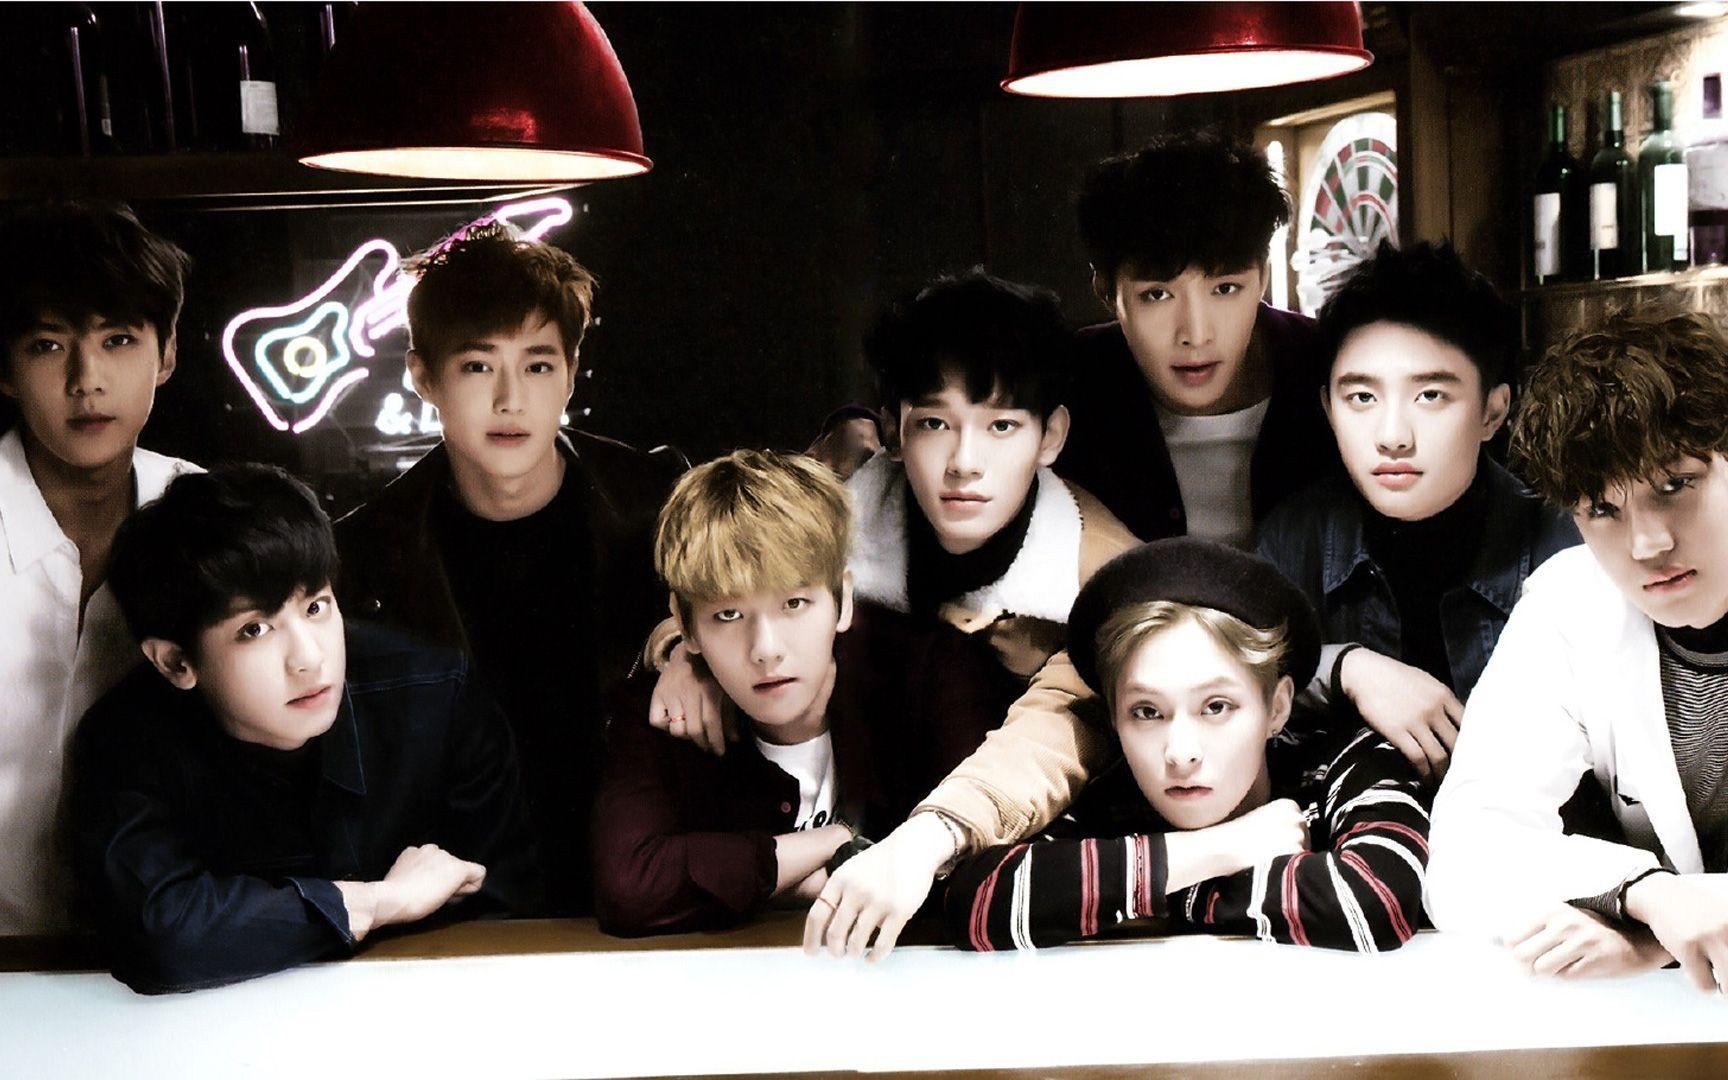 exo照片9人高清照片_exo图片全体照9人